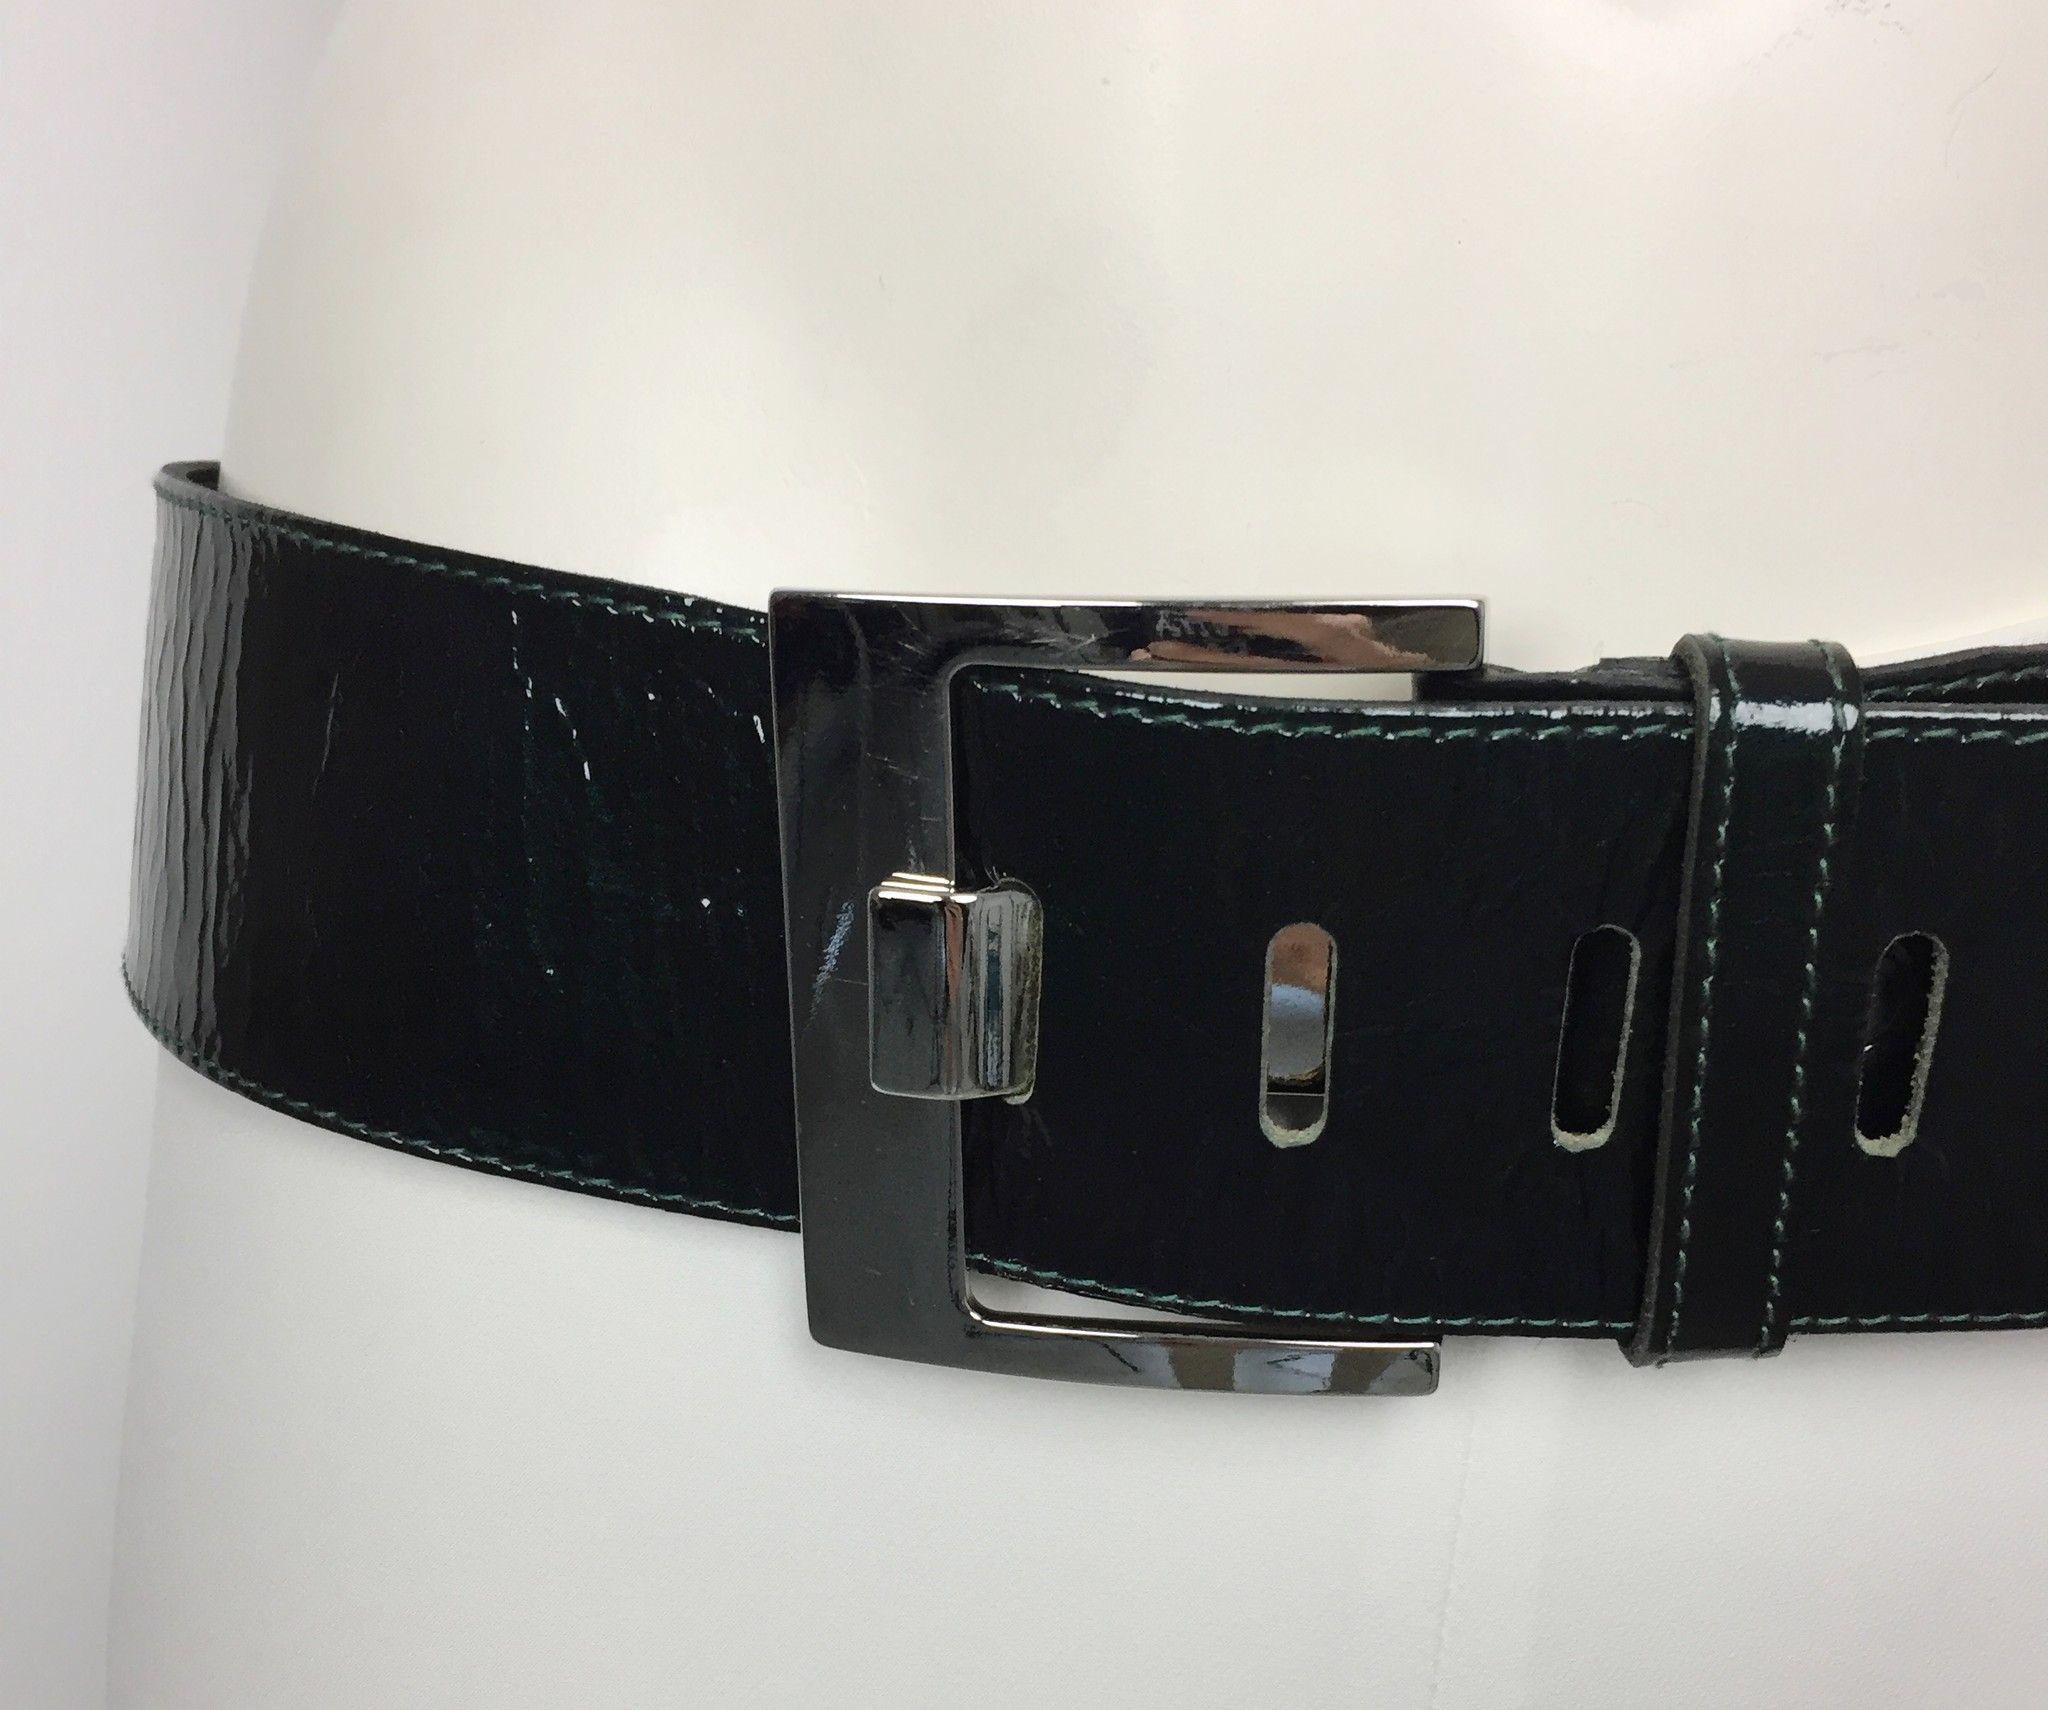 Cintura LadyBug in Vernice con Fibbia in Acciaio Cod.9845